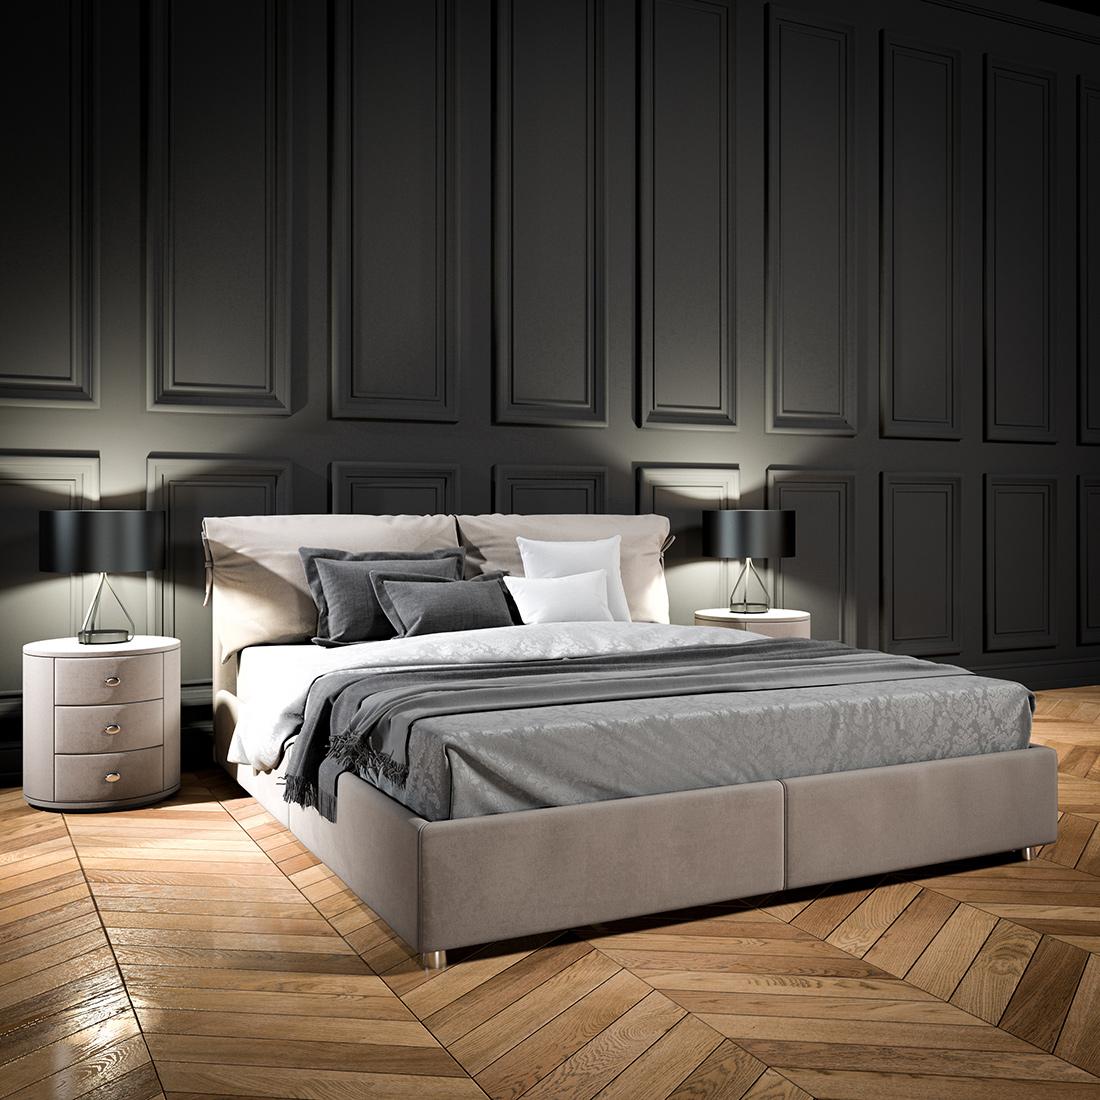 1-letto-imbottito-1